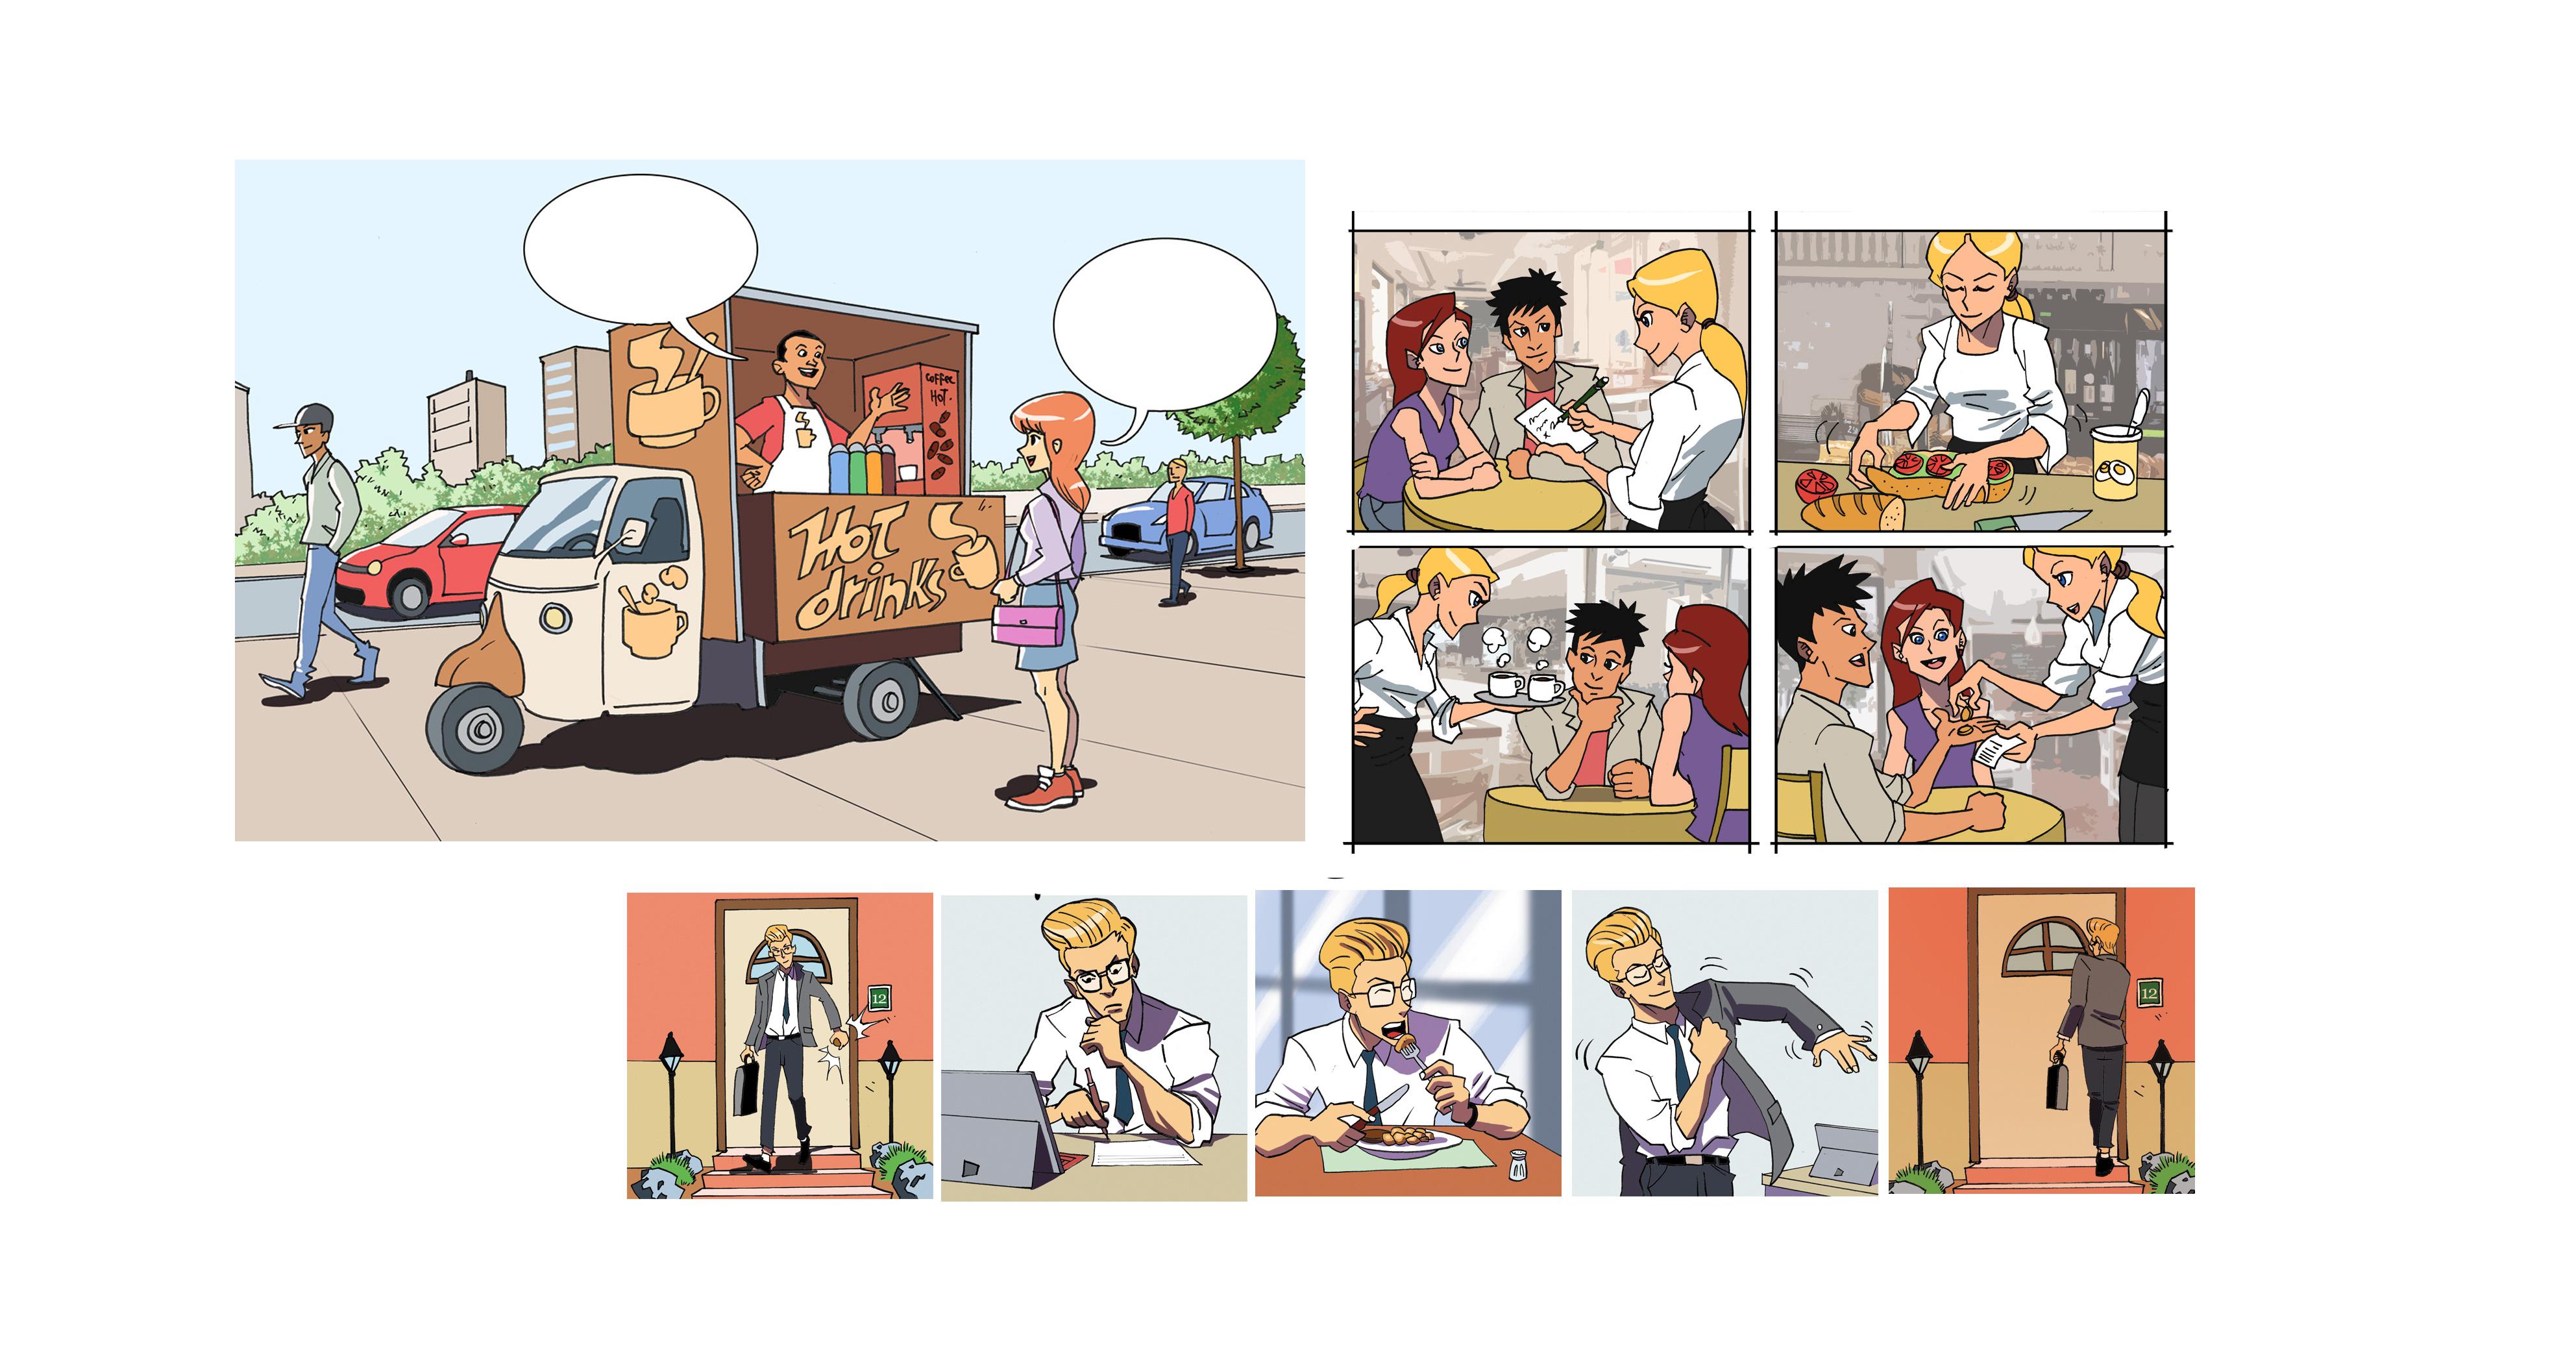 alfonso recio illustration BD travail manga